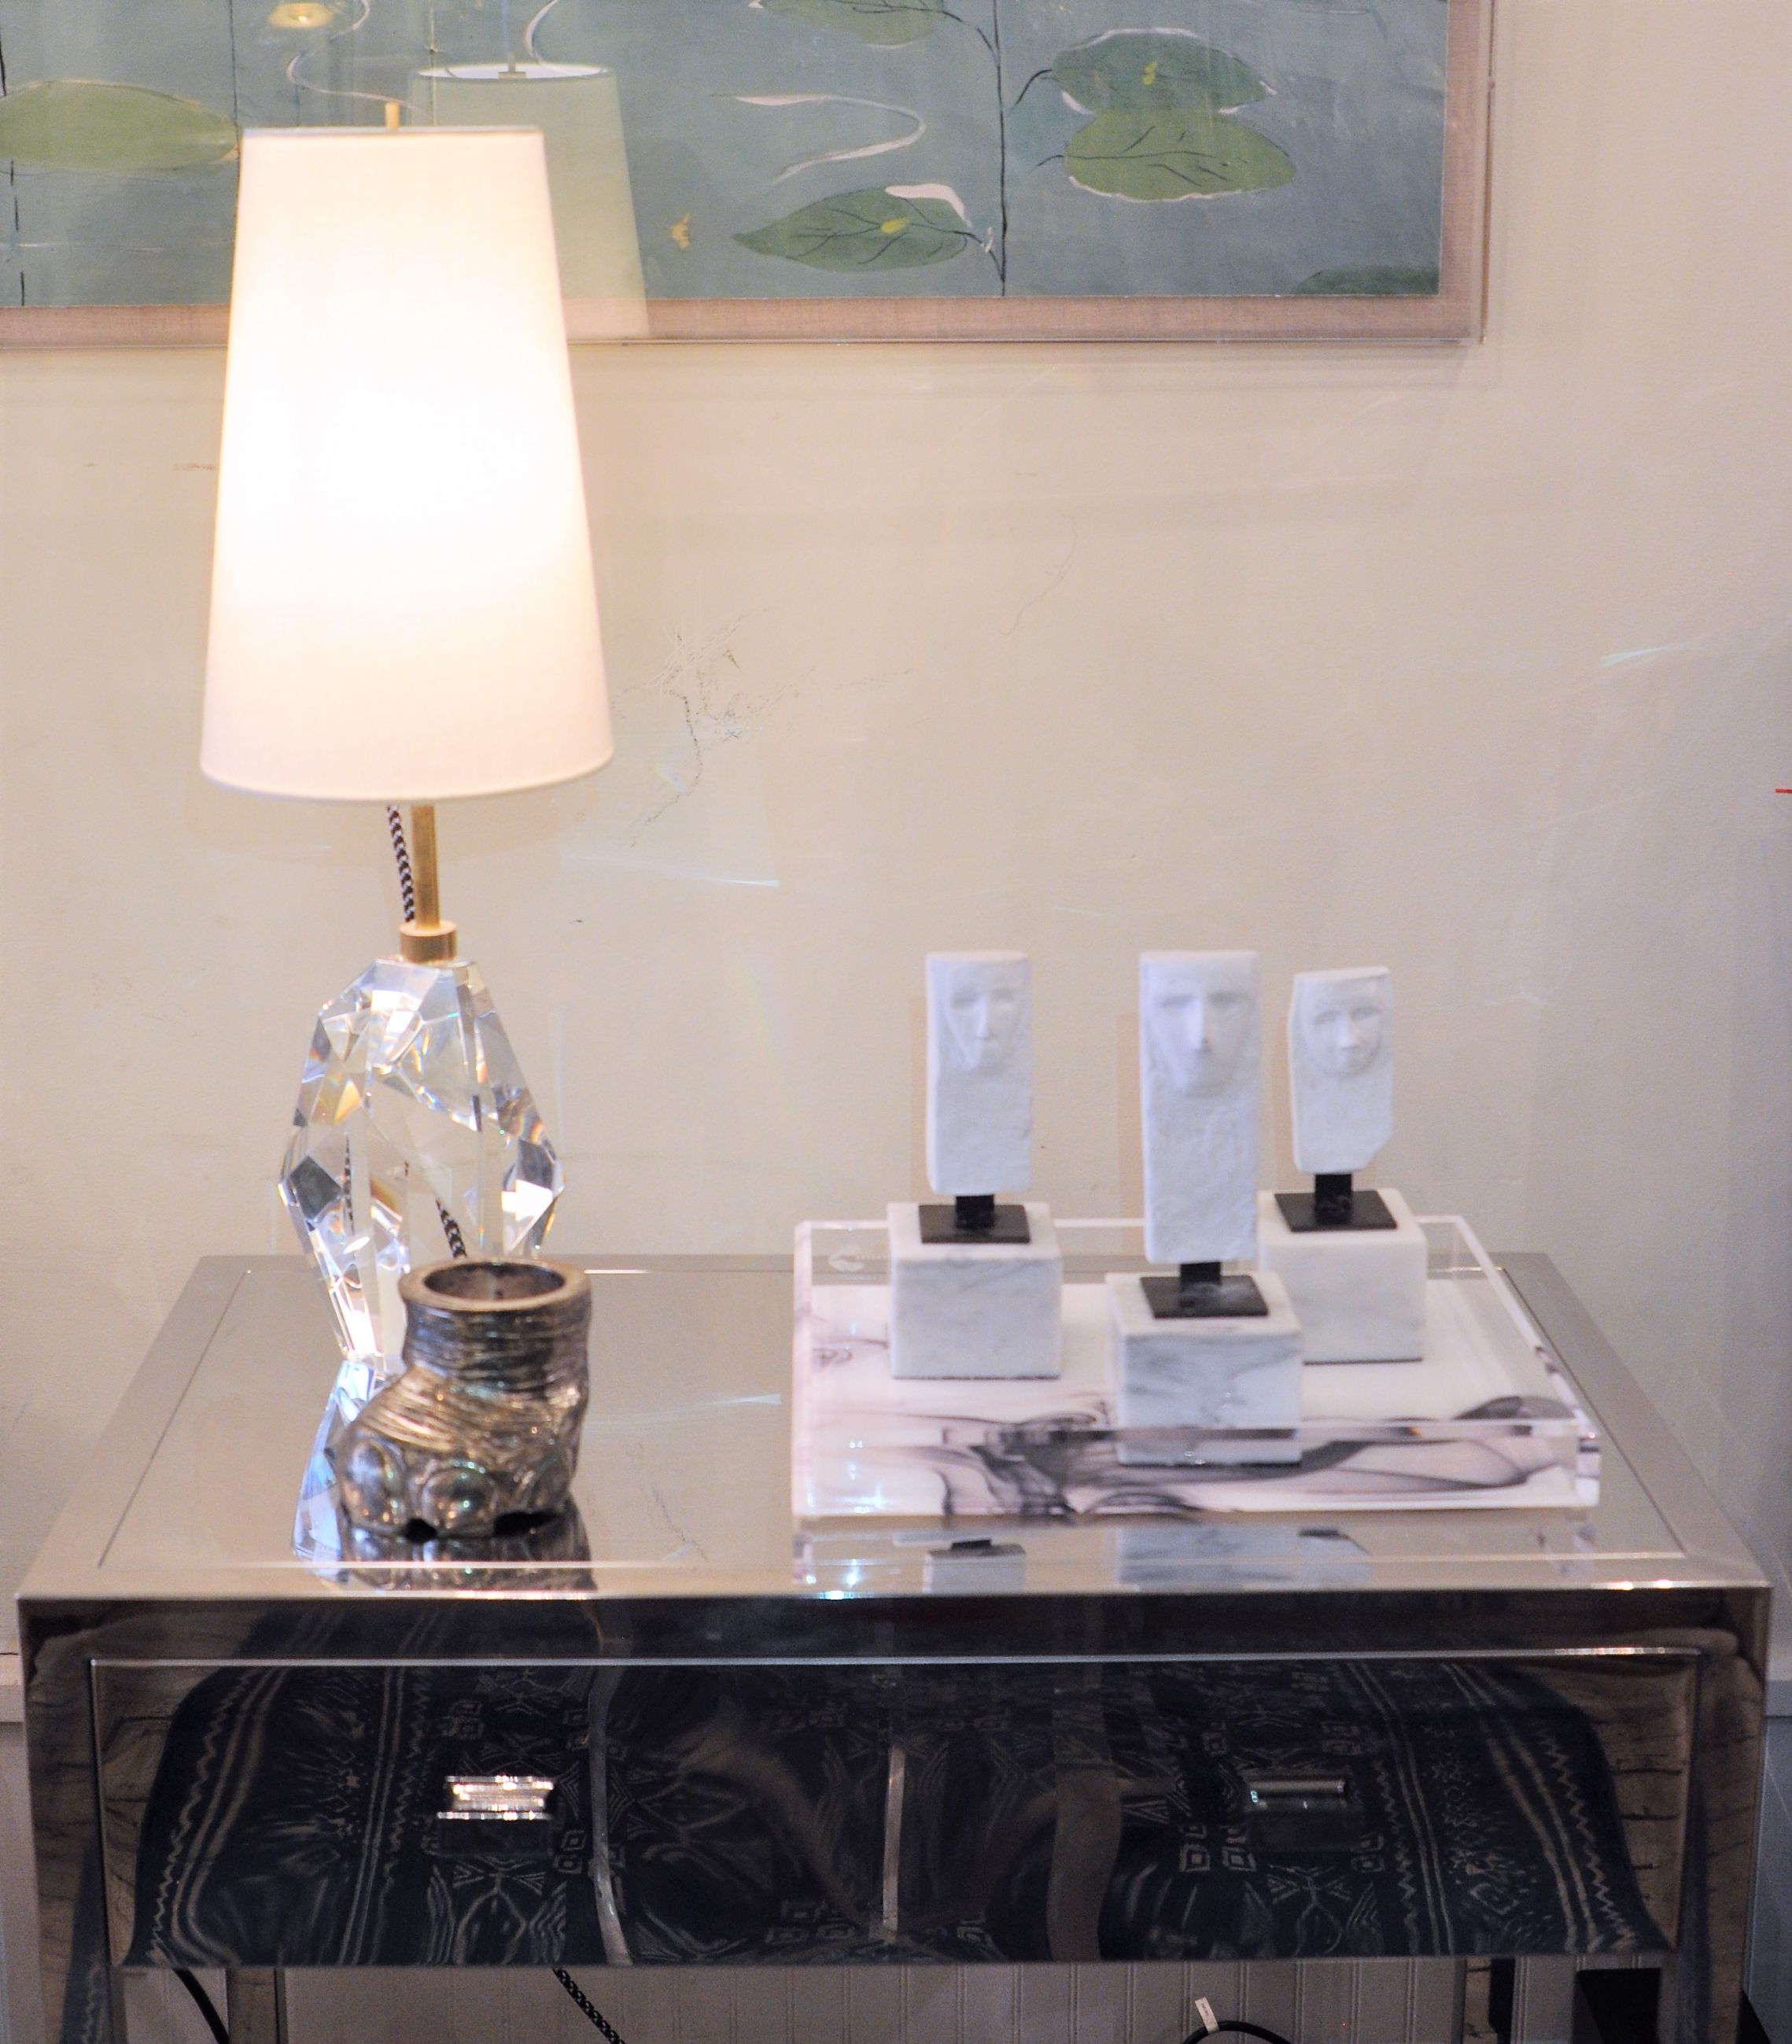 Kelly Wearstler Halcyon Table Lamp - Mecox Gardens